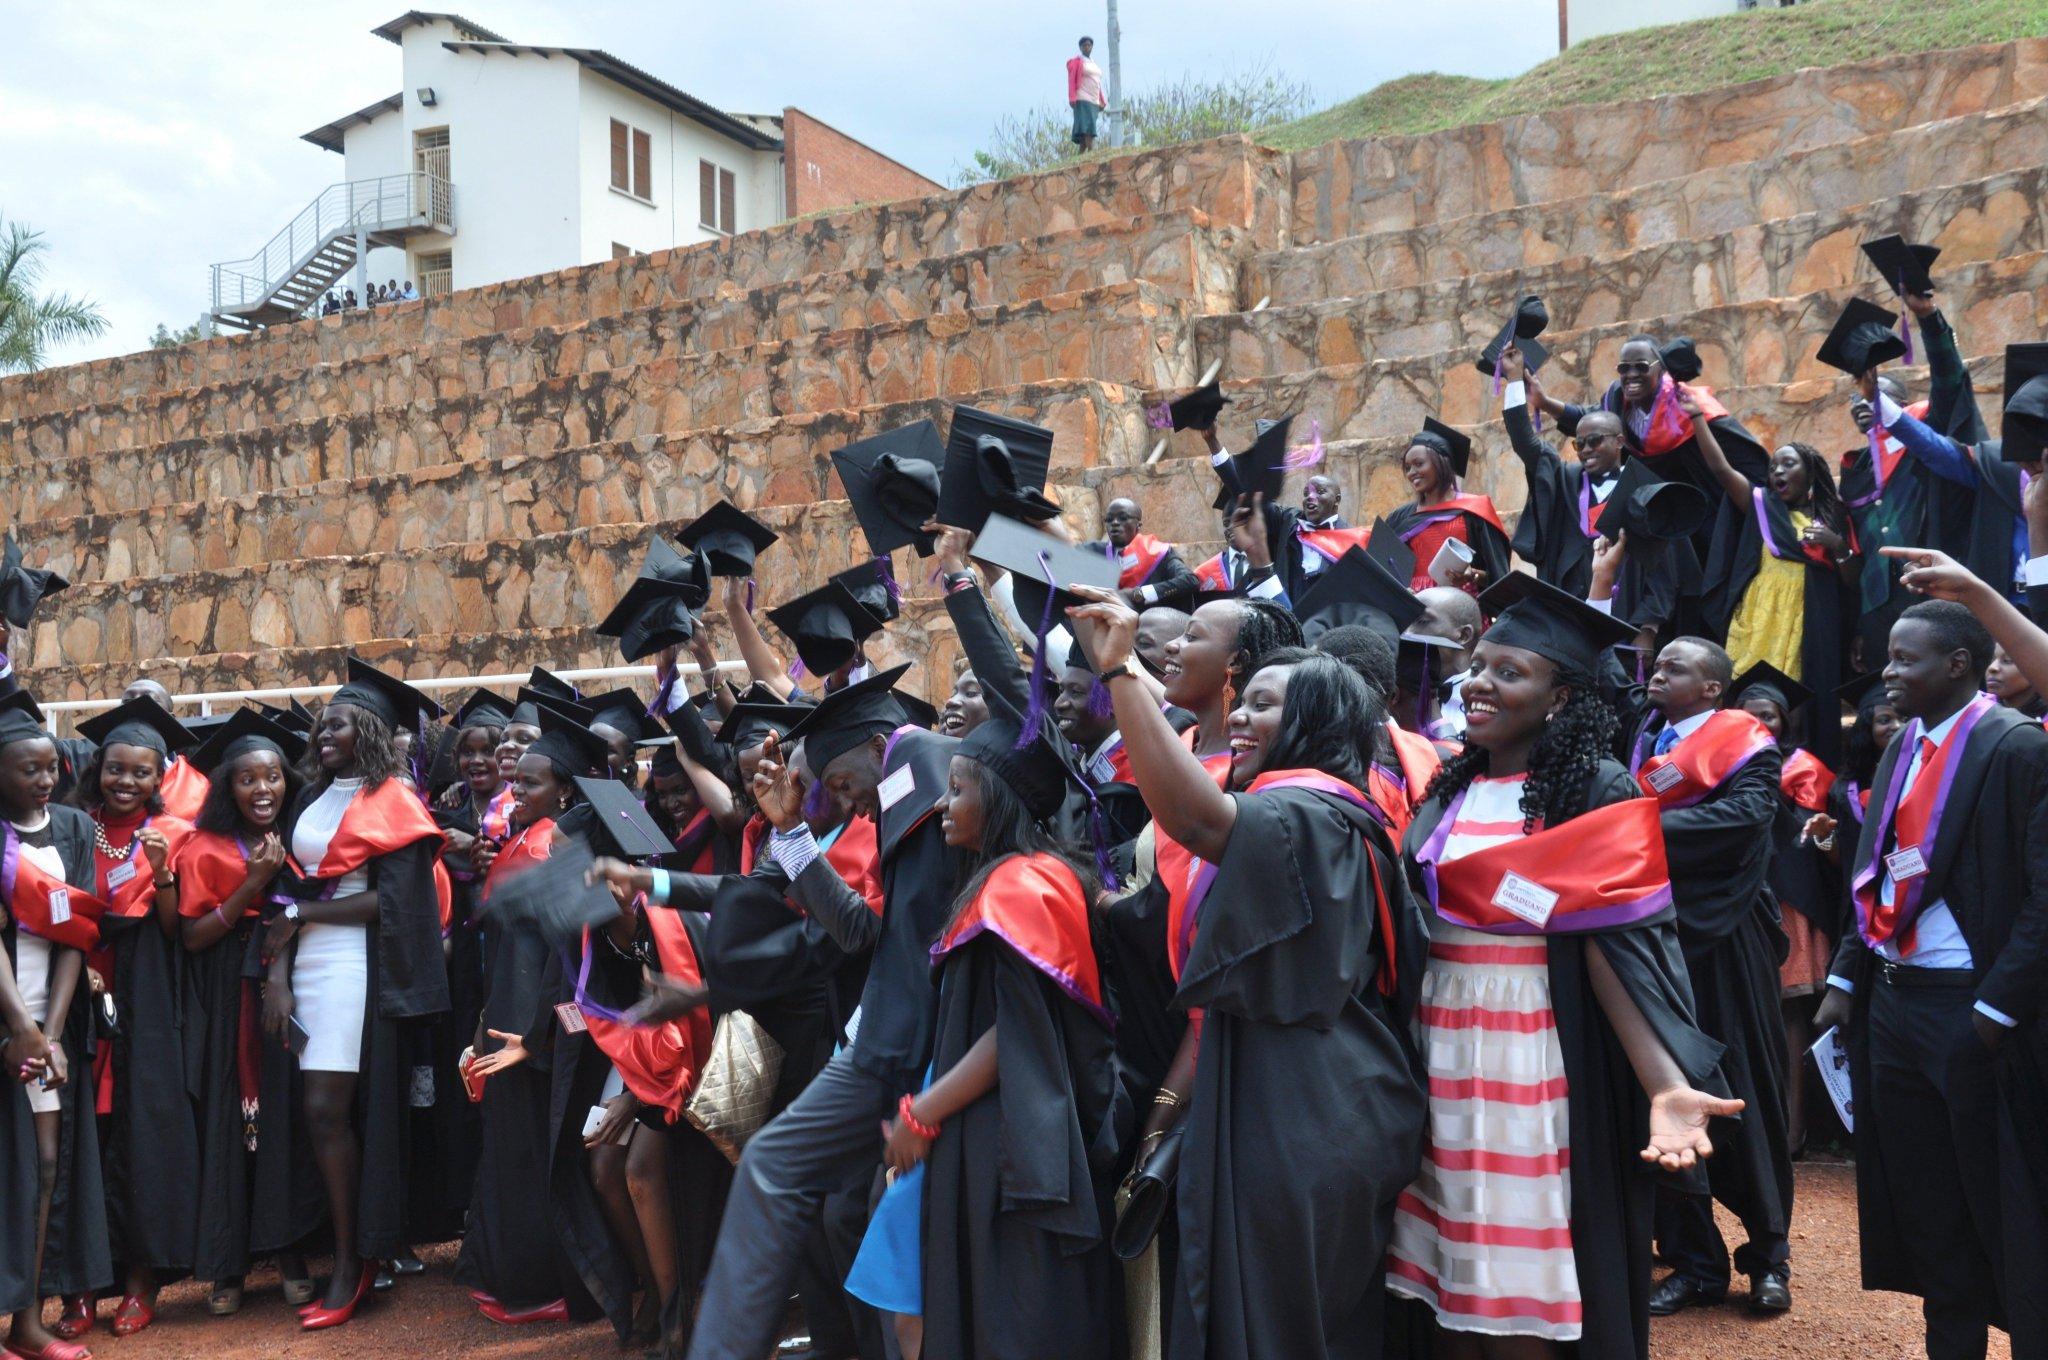 Graduates of UCU at a past graduation ceremony. Courtesy photo.